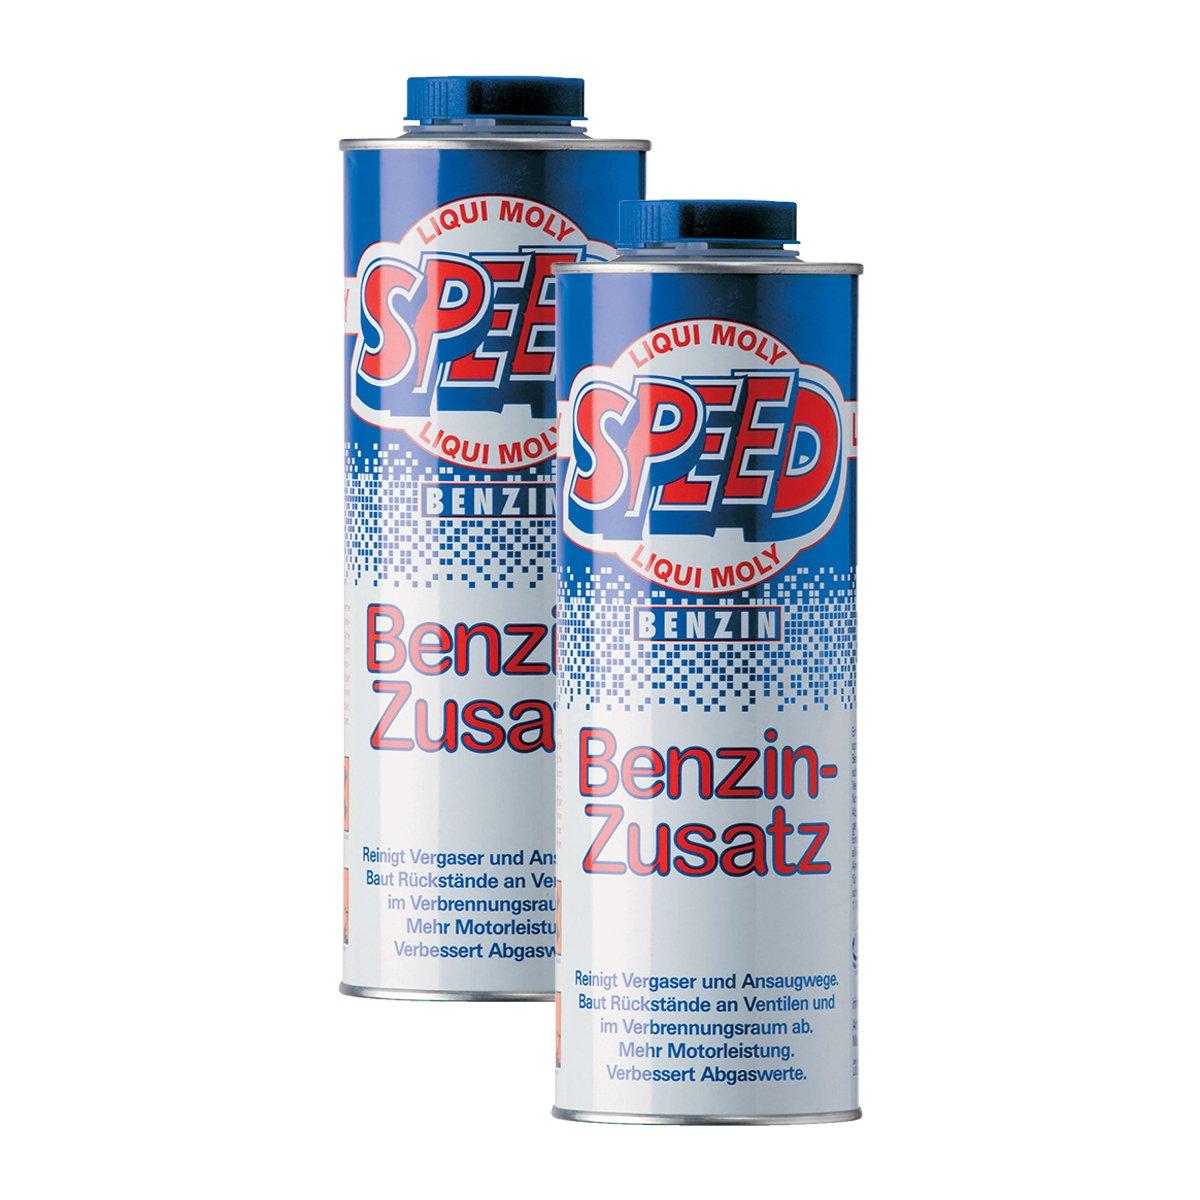 2x LIQUI MOLY 5105 Speed Benzin Zusatz Zugabe Kraftstoff Additiv 1L